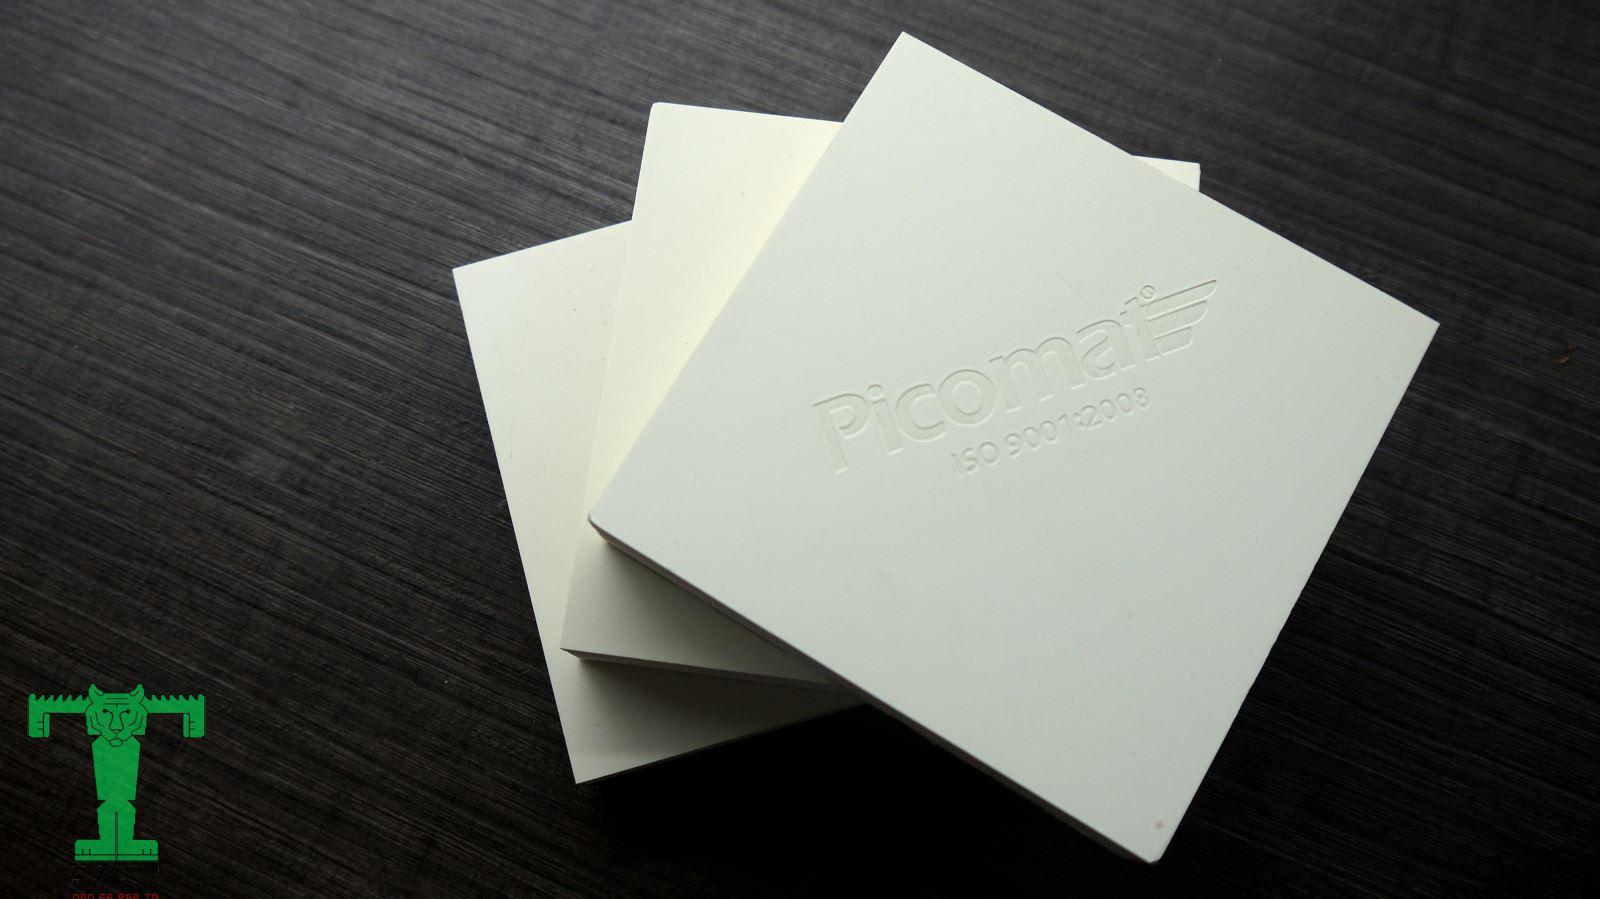 Tấm nhựa PVC Picomat